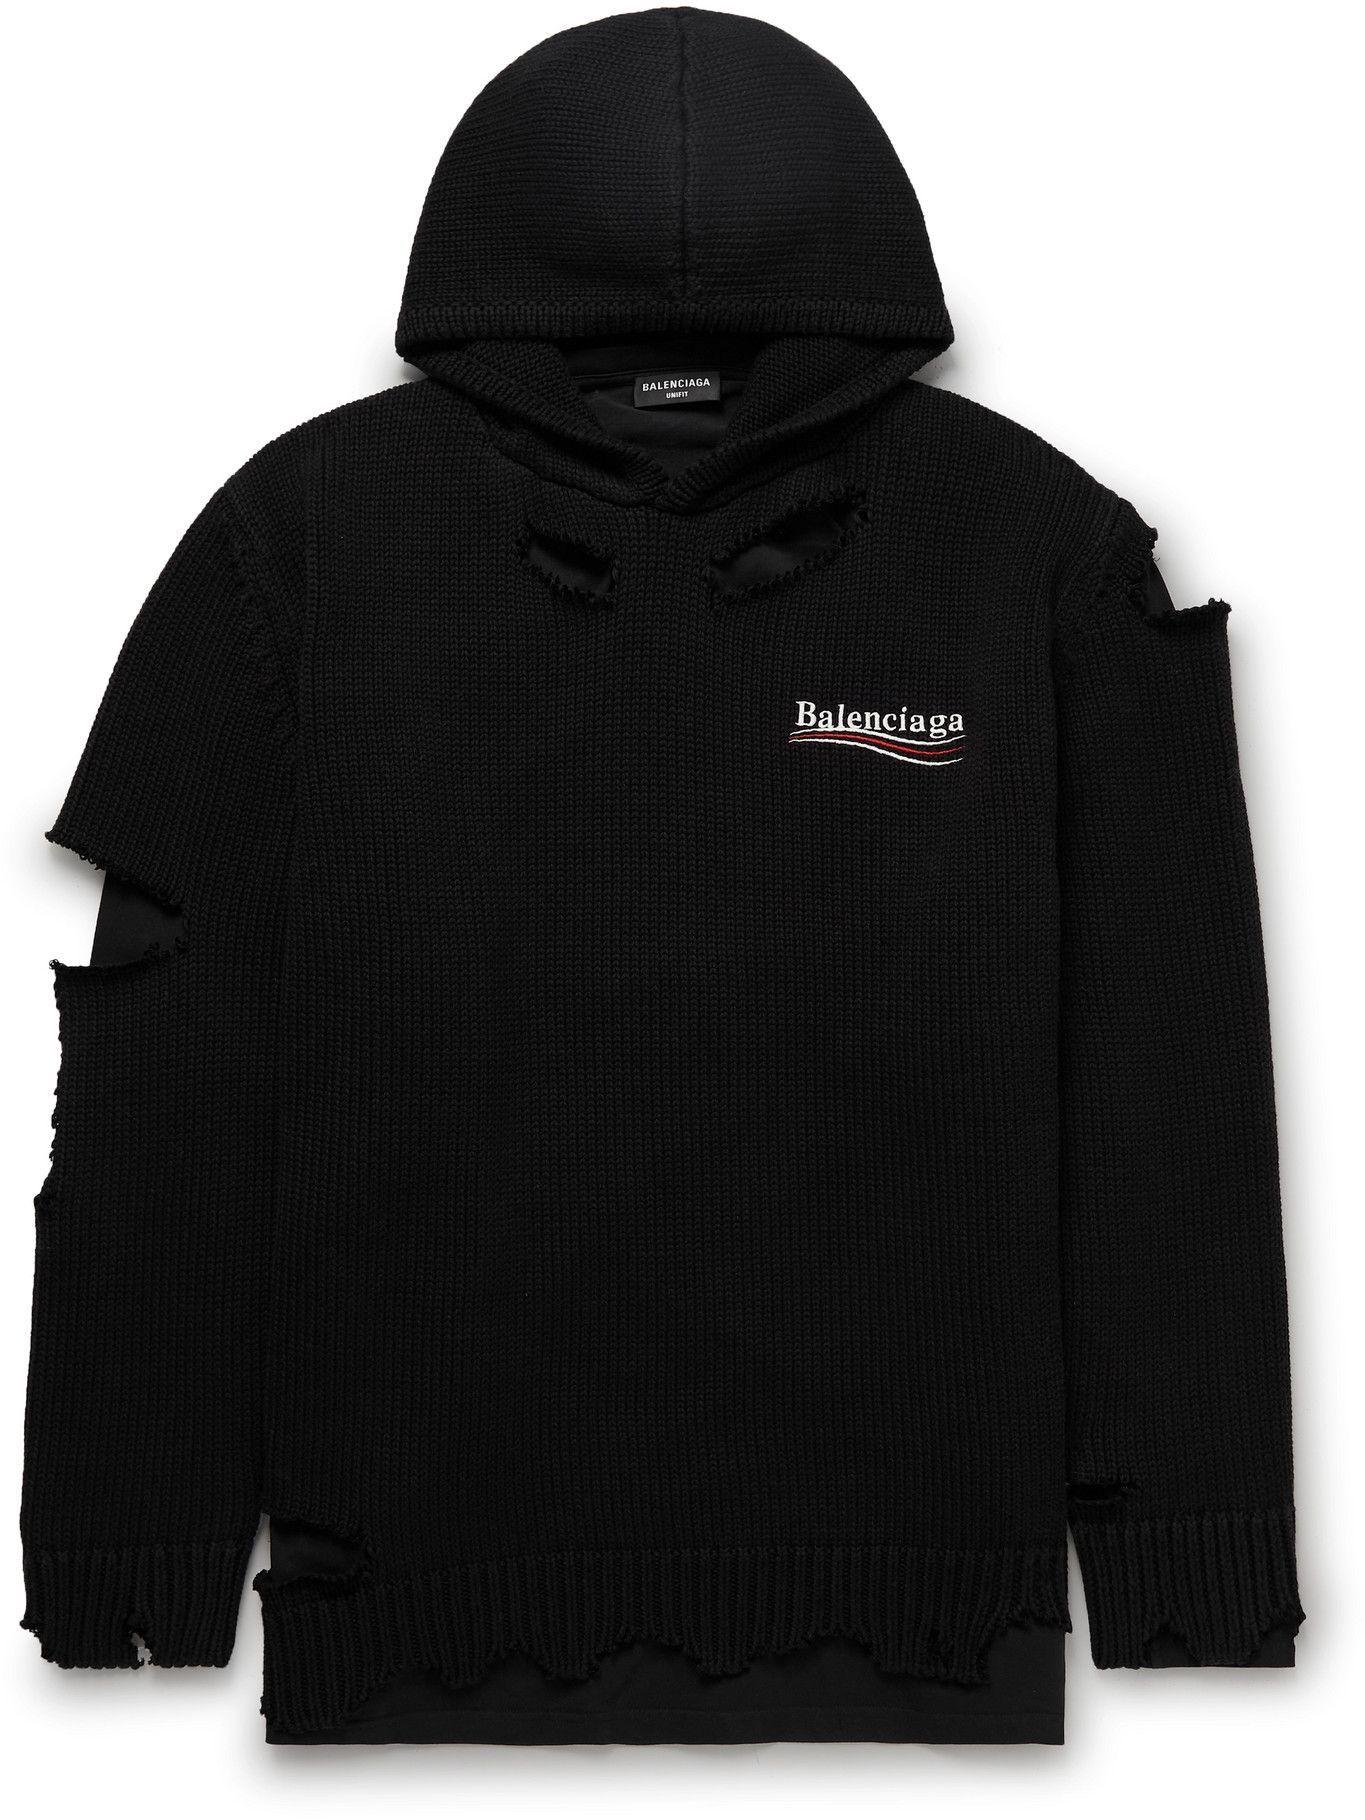 BALENCIAGA - Oversized Distressed Logo-Print Cotton Hoodie - Black